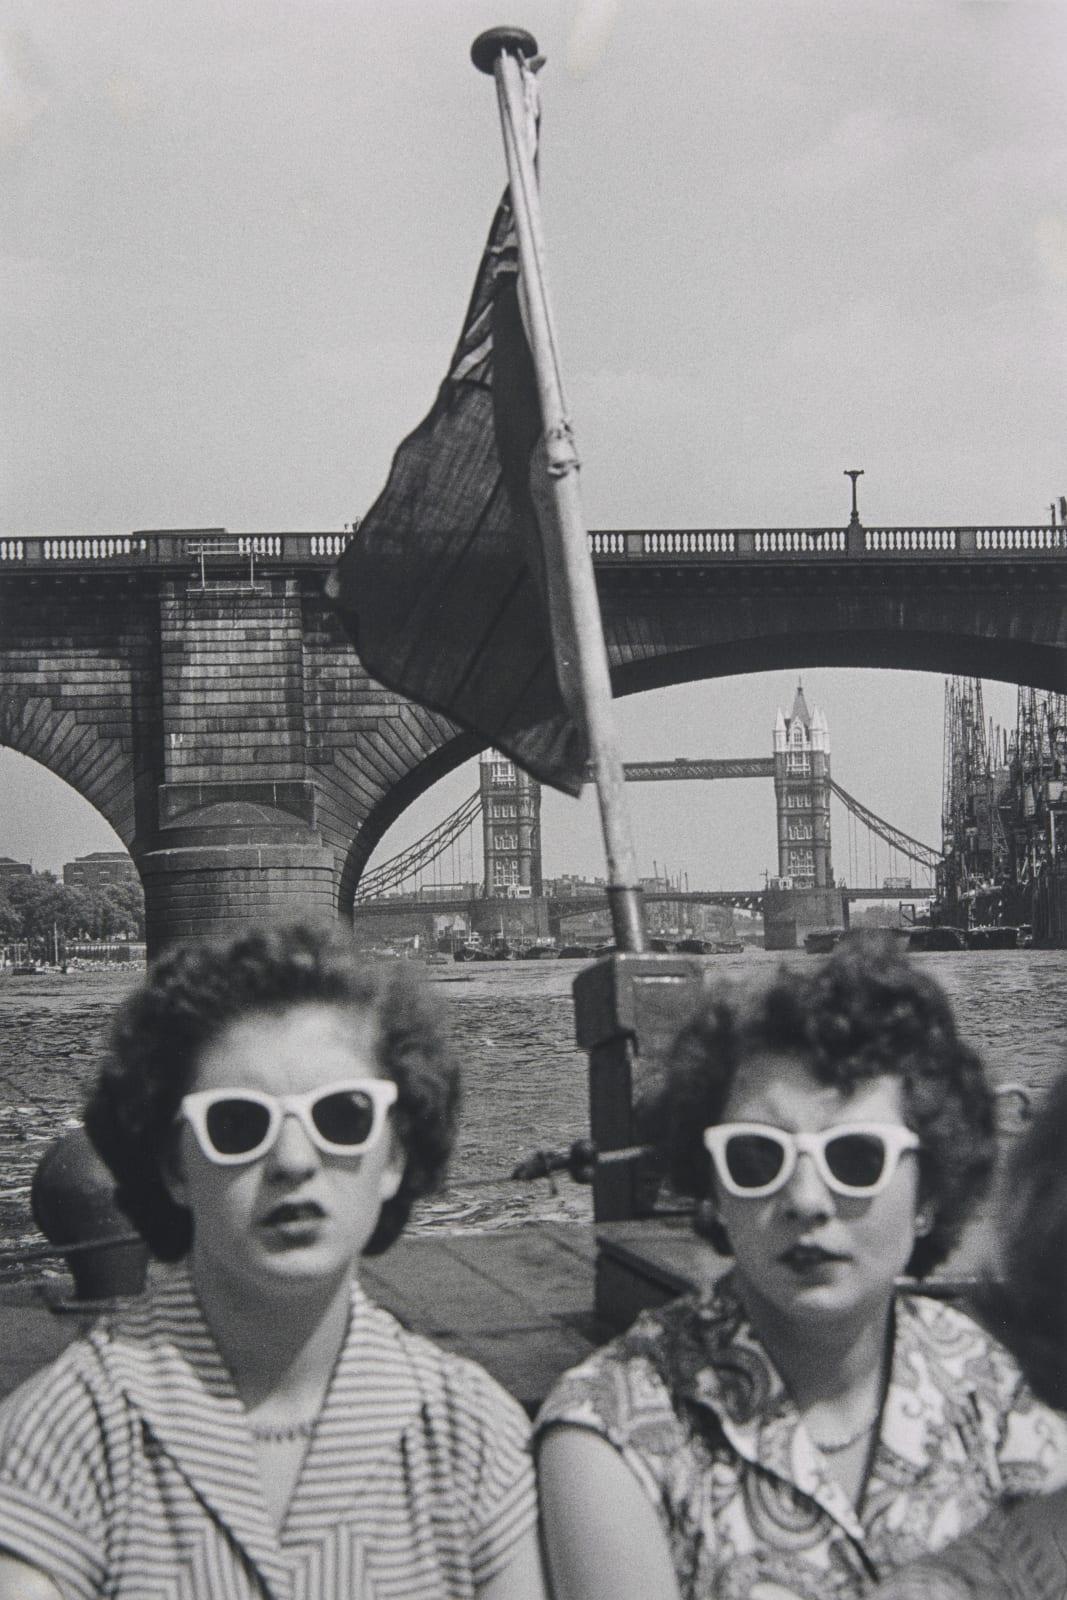 Ernst Haas - London, 1951